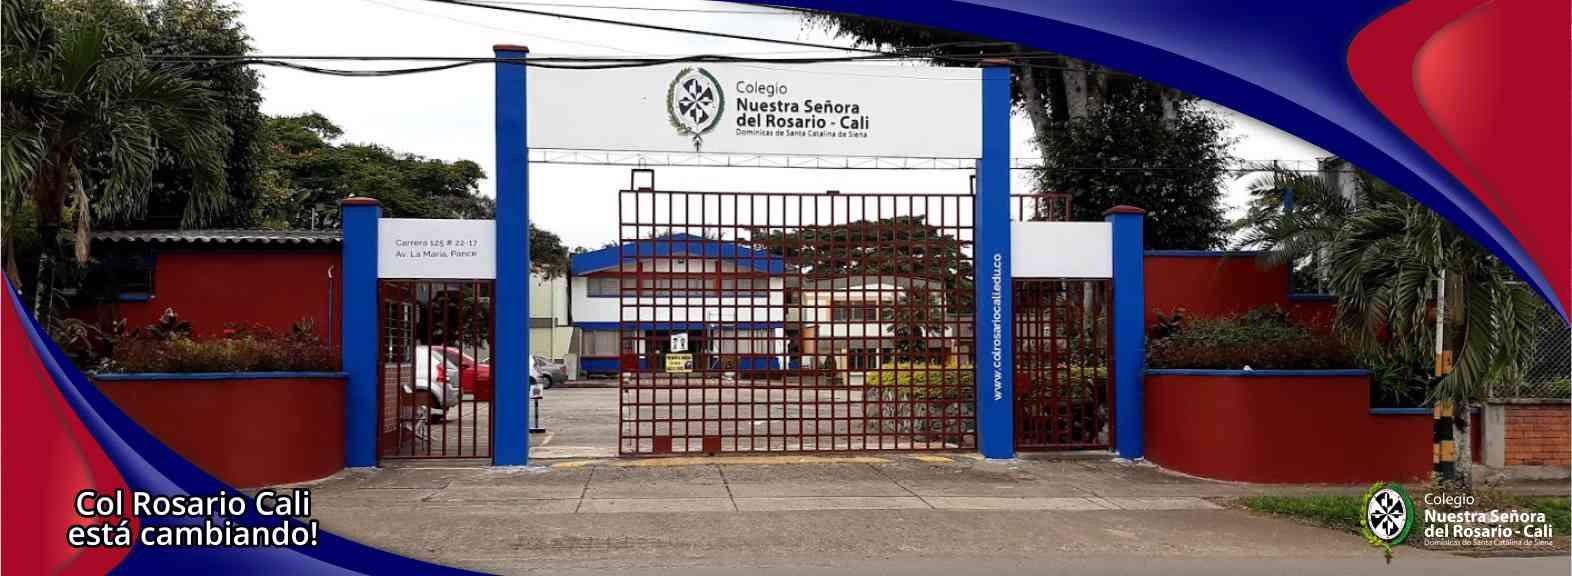 Banner Col Rosario 2107 01